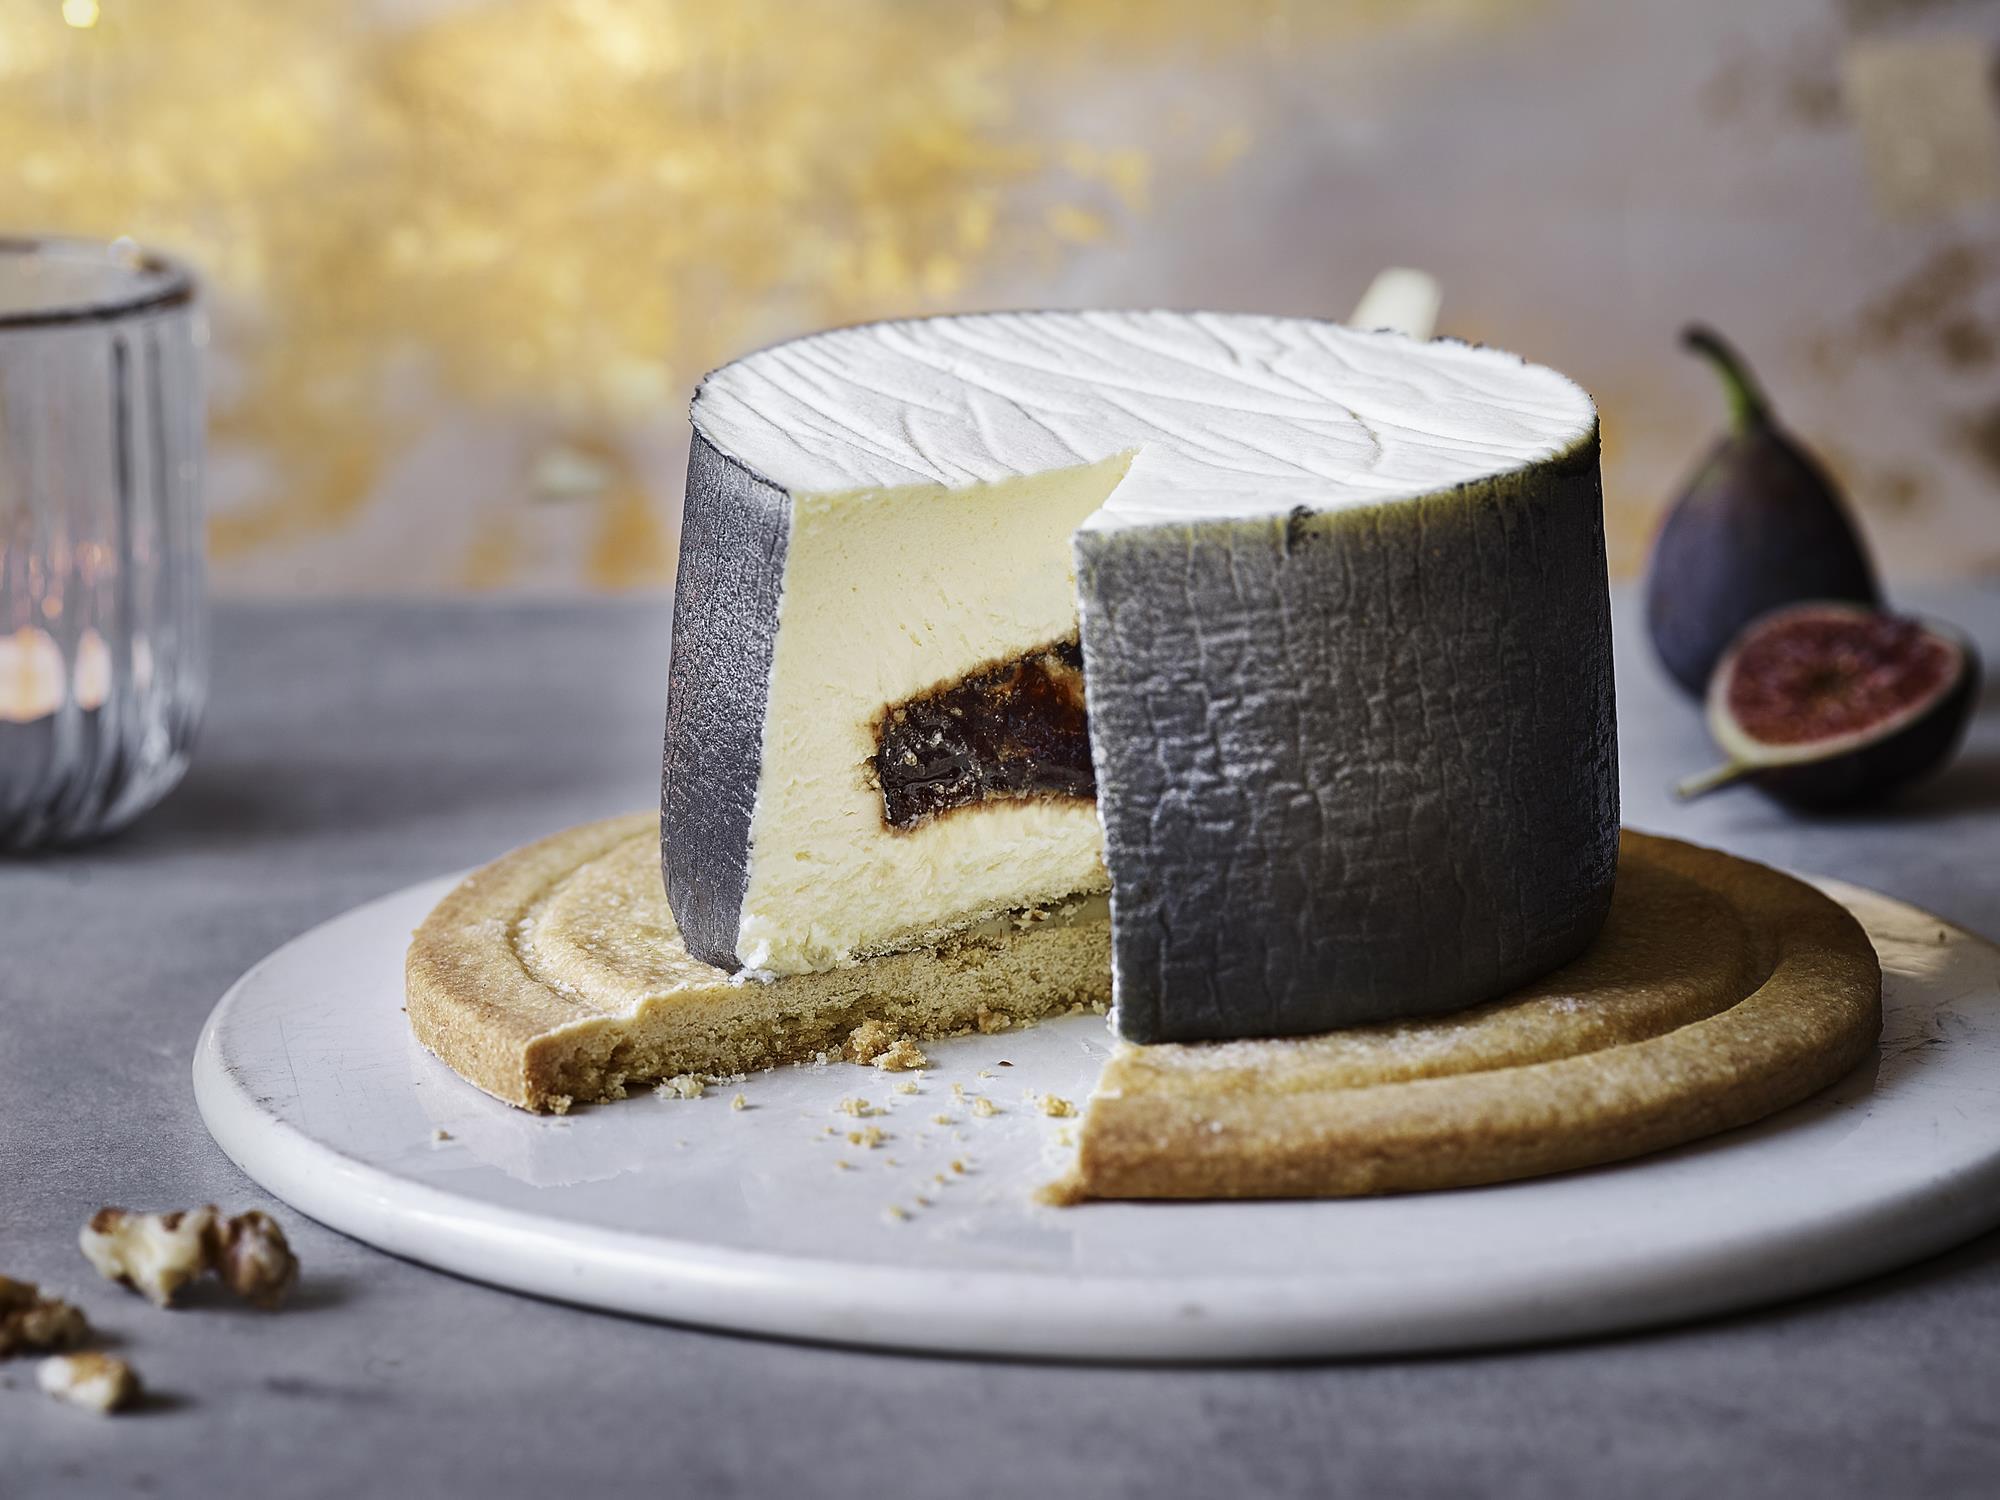 Awe Inspiring Range Preview Waitrose Christmas 2019 Analysis Features The Funny Birthday Cards Online Inifofree Goldxyz